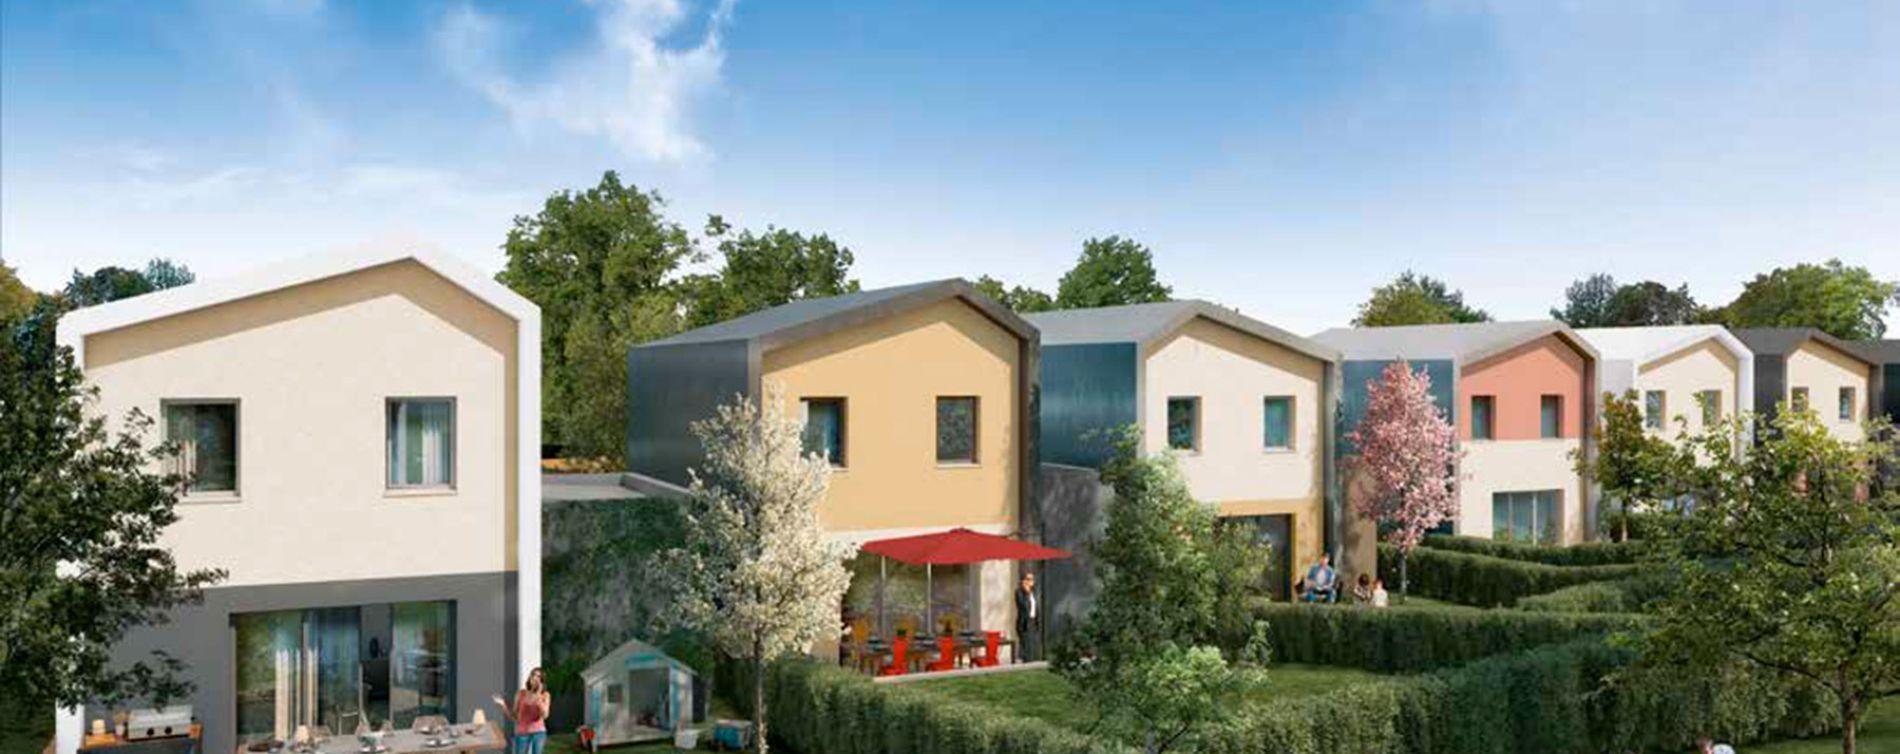 Résidence Rosa Residenza à Chartres